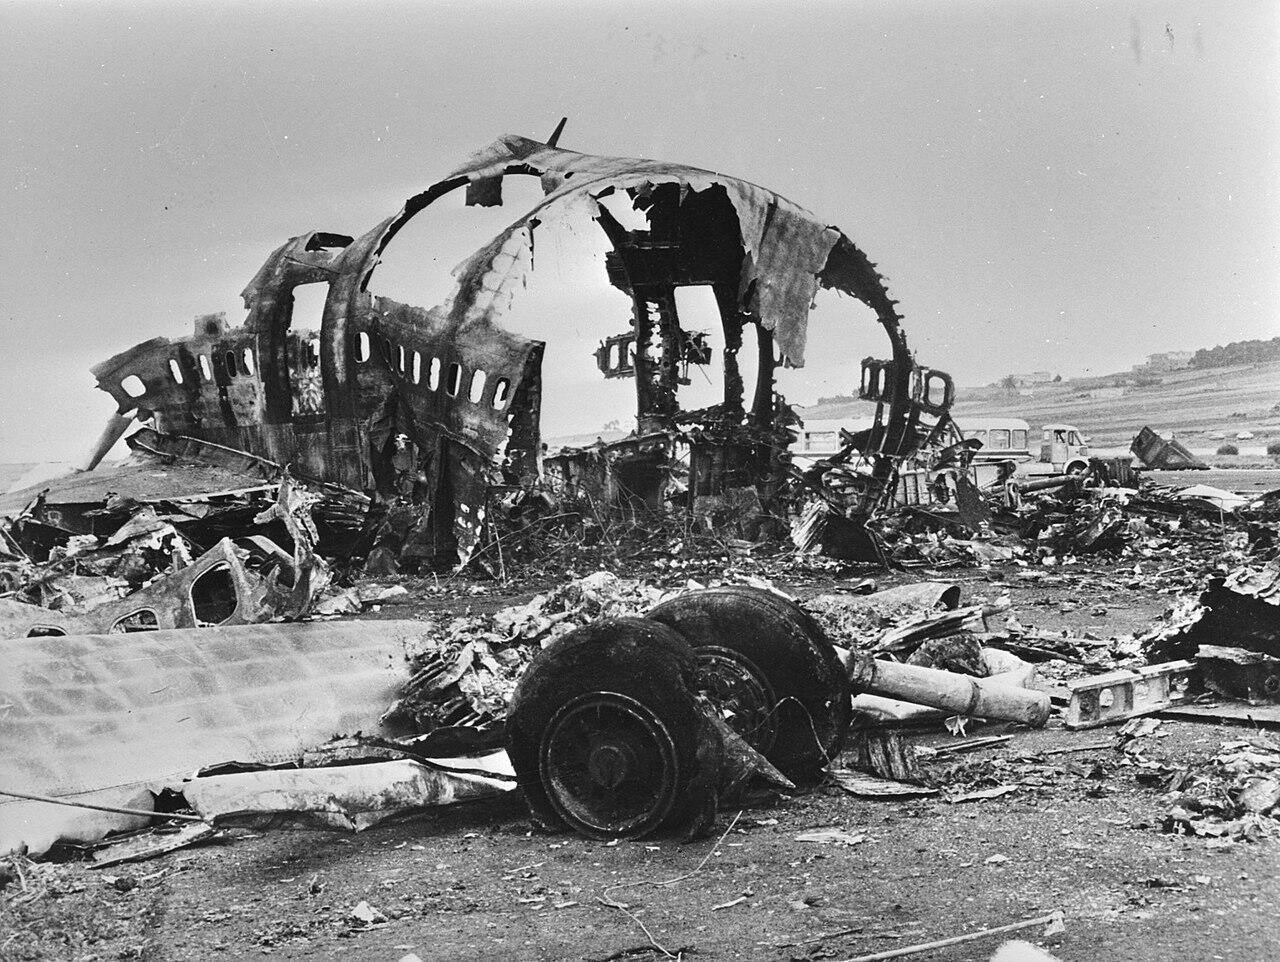 Inilah Kecelakaan Penerbangan Komersial Paling Mematikan Sepanjang Sejarah